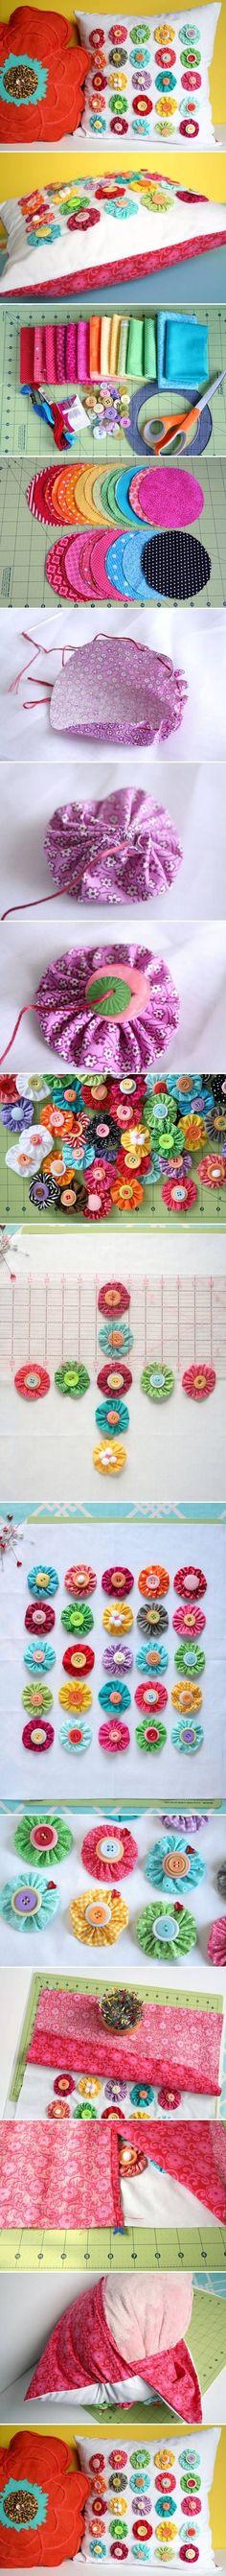 DIY Fabric Decorative Flowers DIY Fabric Decorative Flowers by crazysad